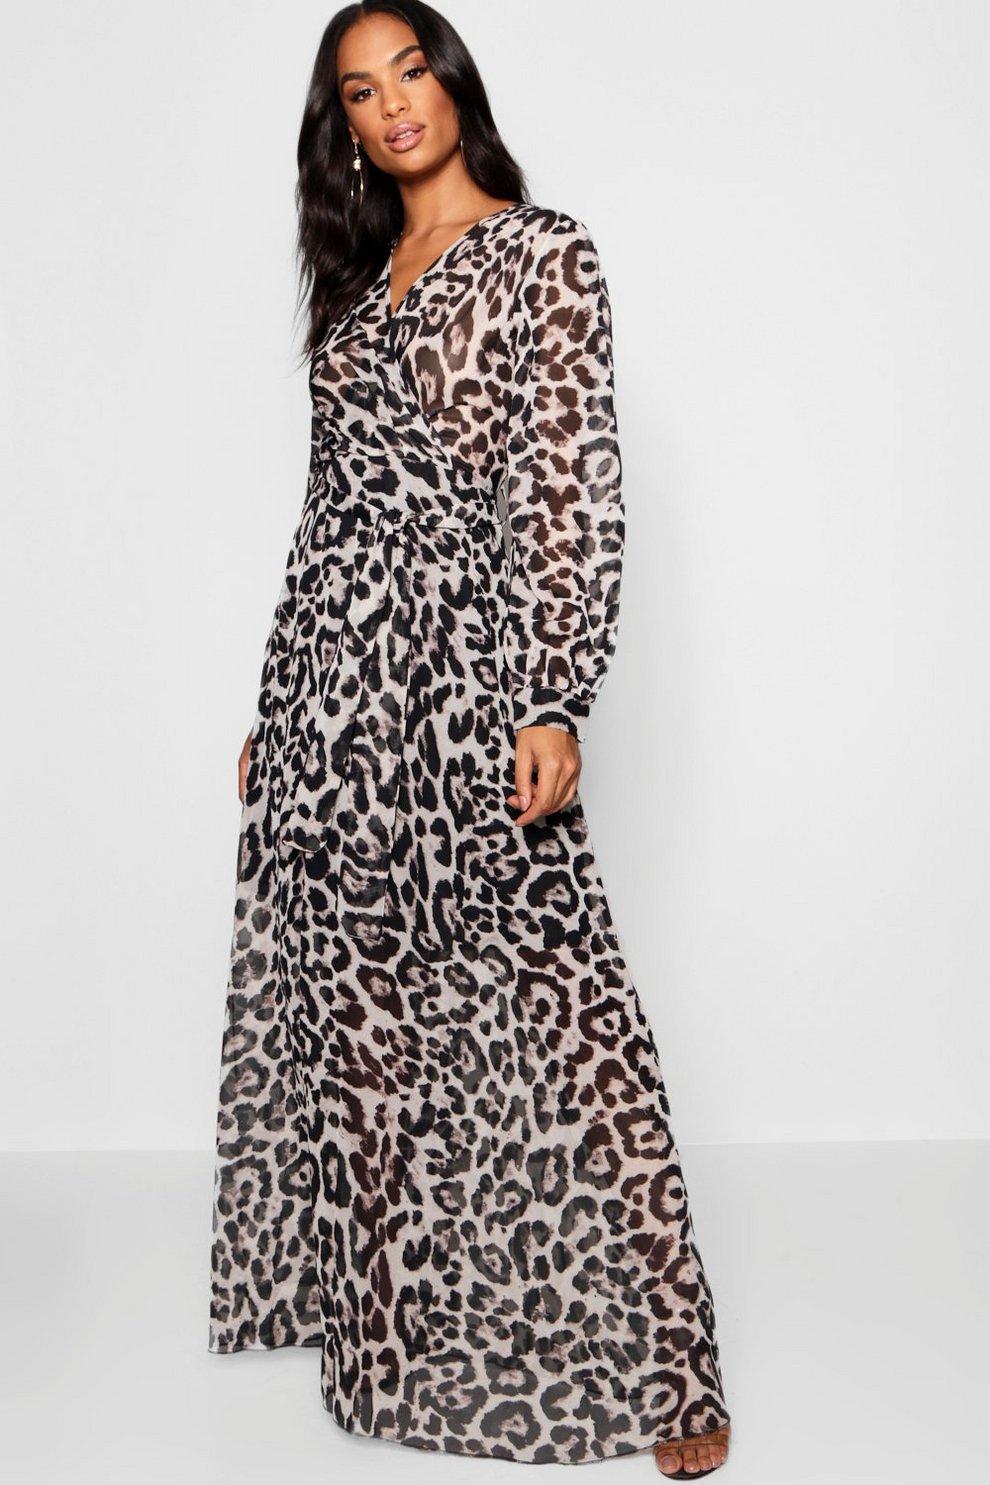 85814bdf2e4 Tall Sheer Leopard Print Maxi Dress | Boohoo